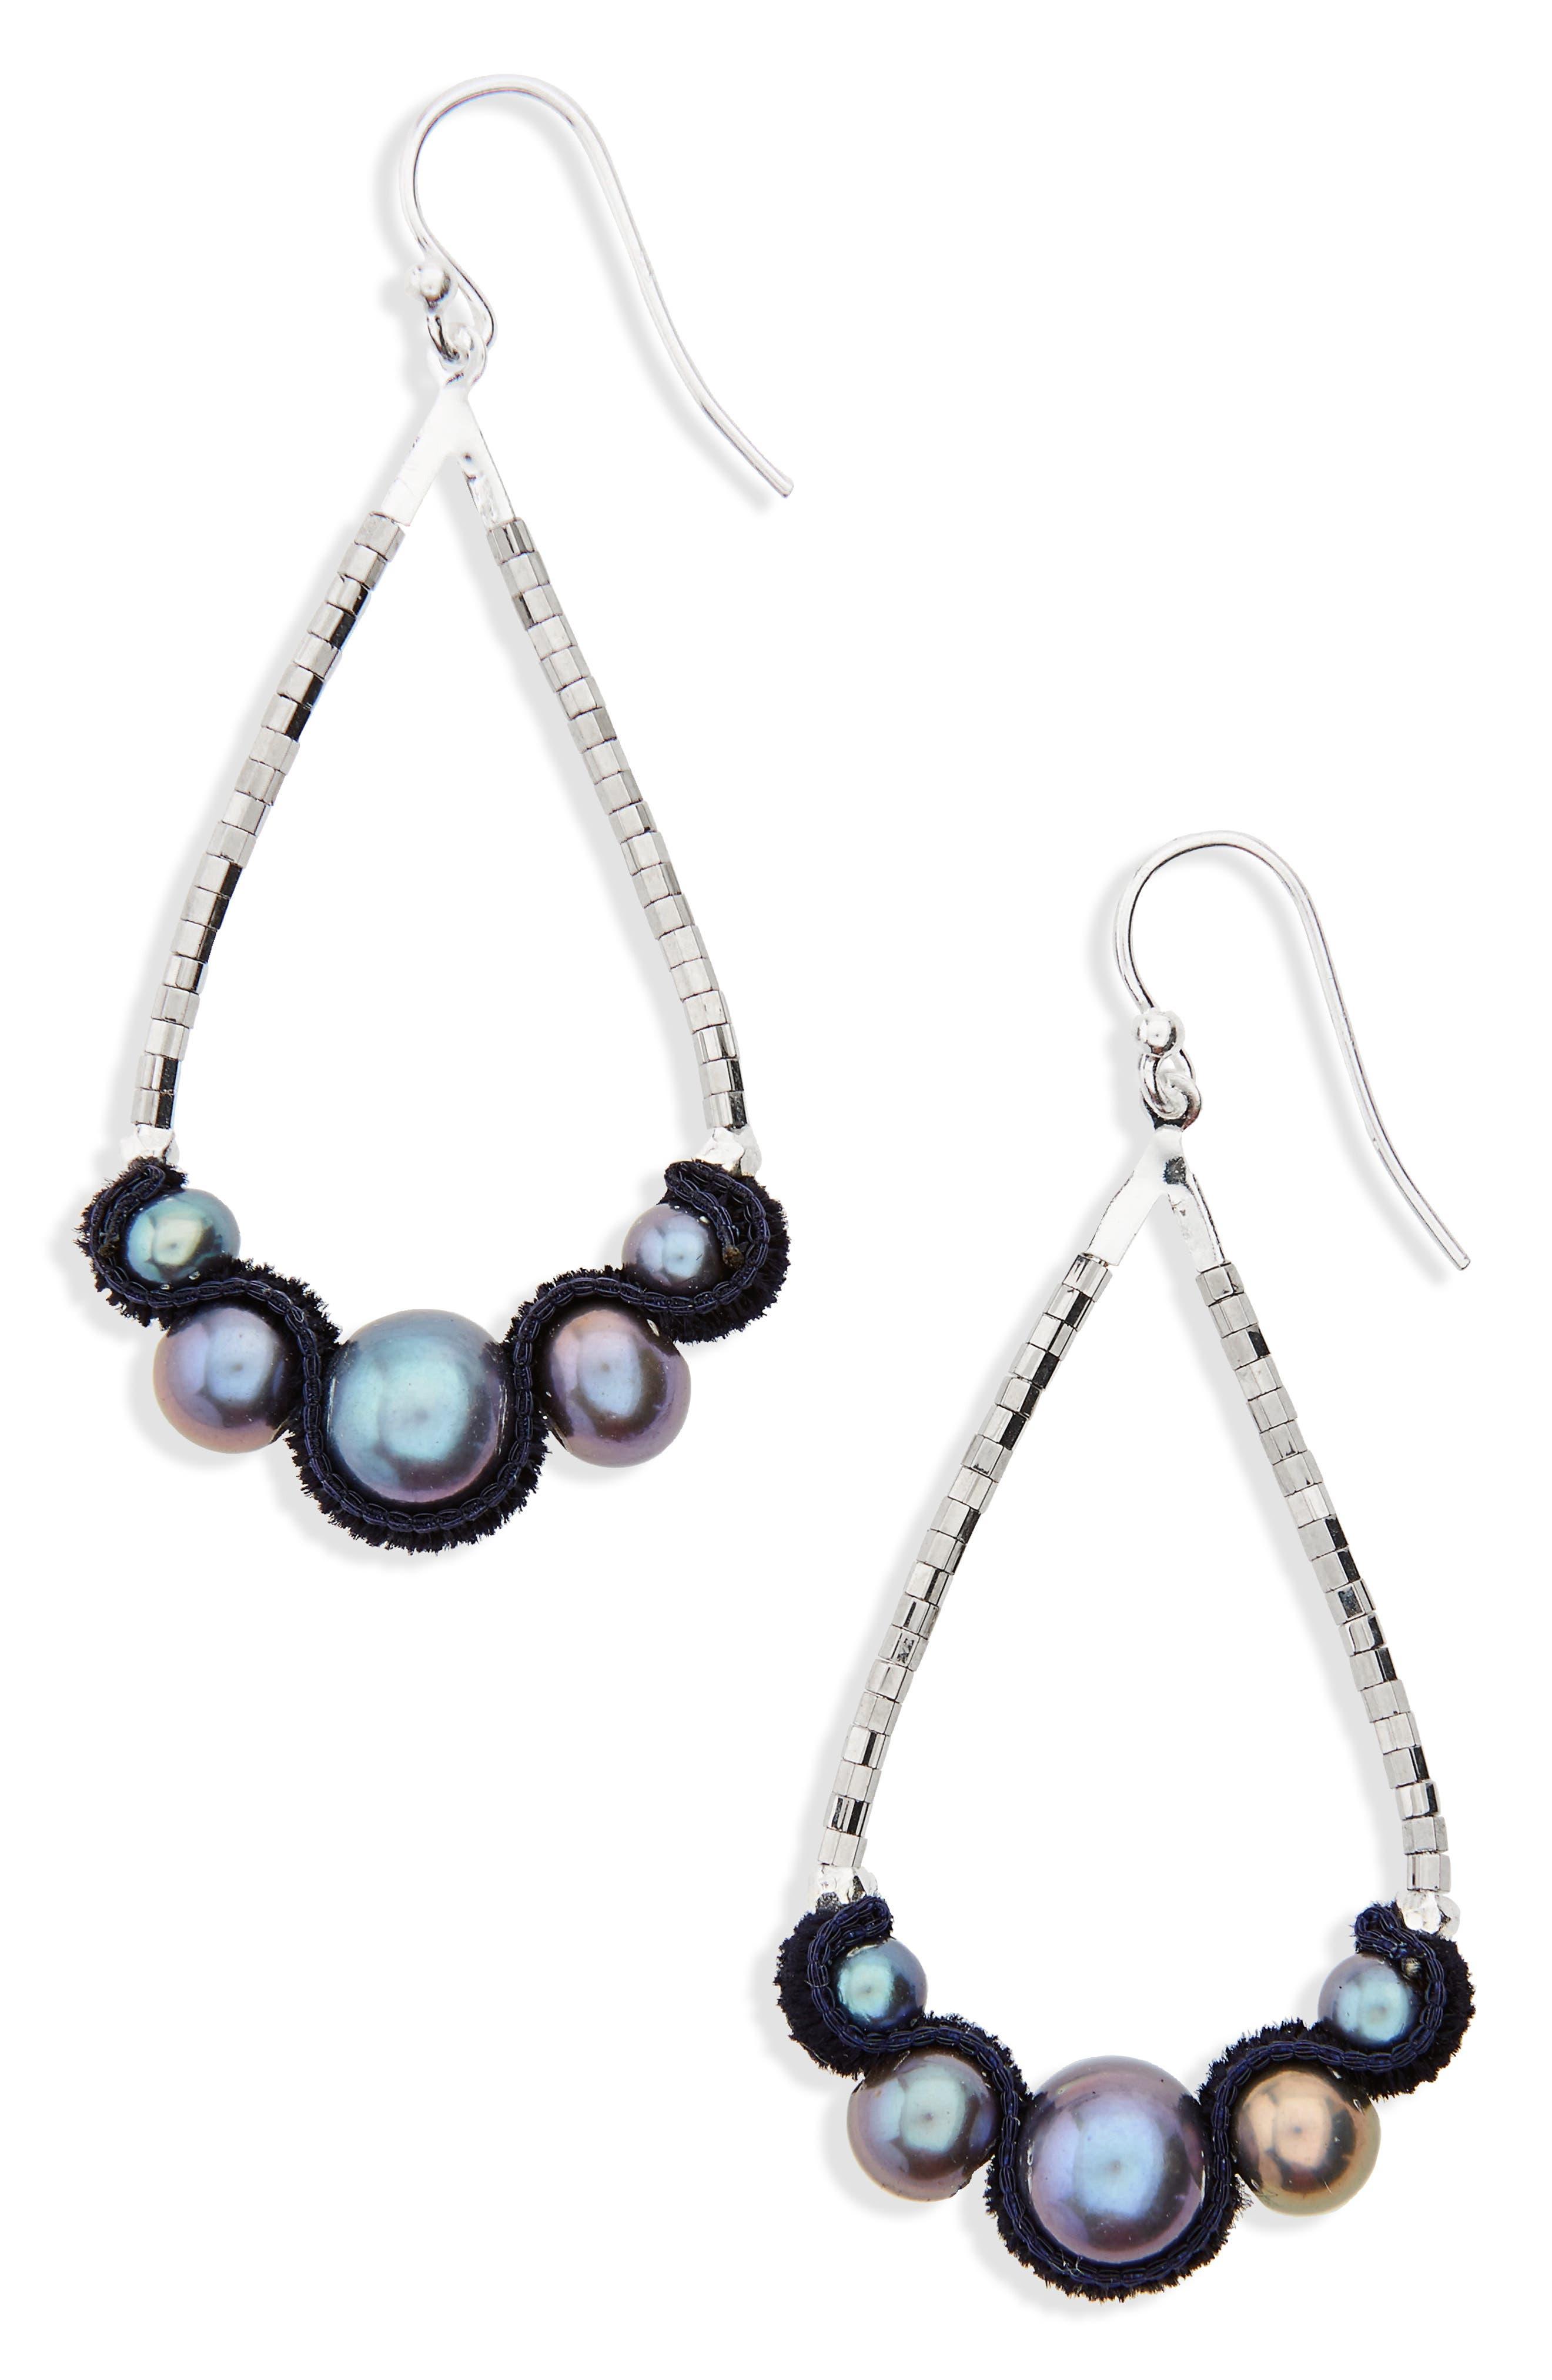 Velvet & Pearl Drop Earrings,                             Main thumbnail 1, color,                             400